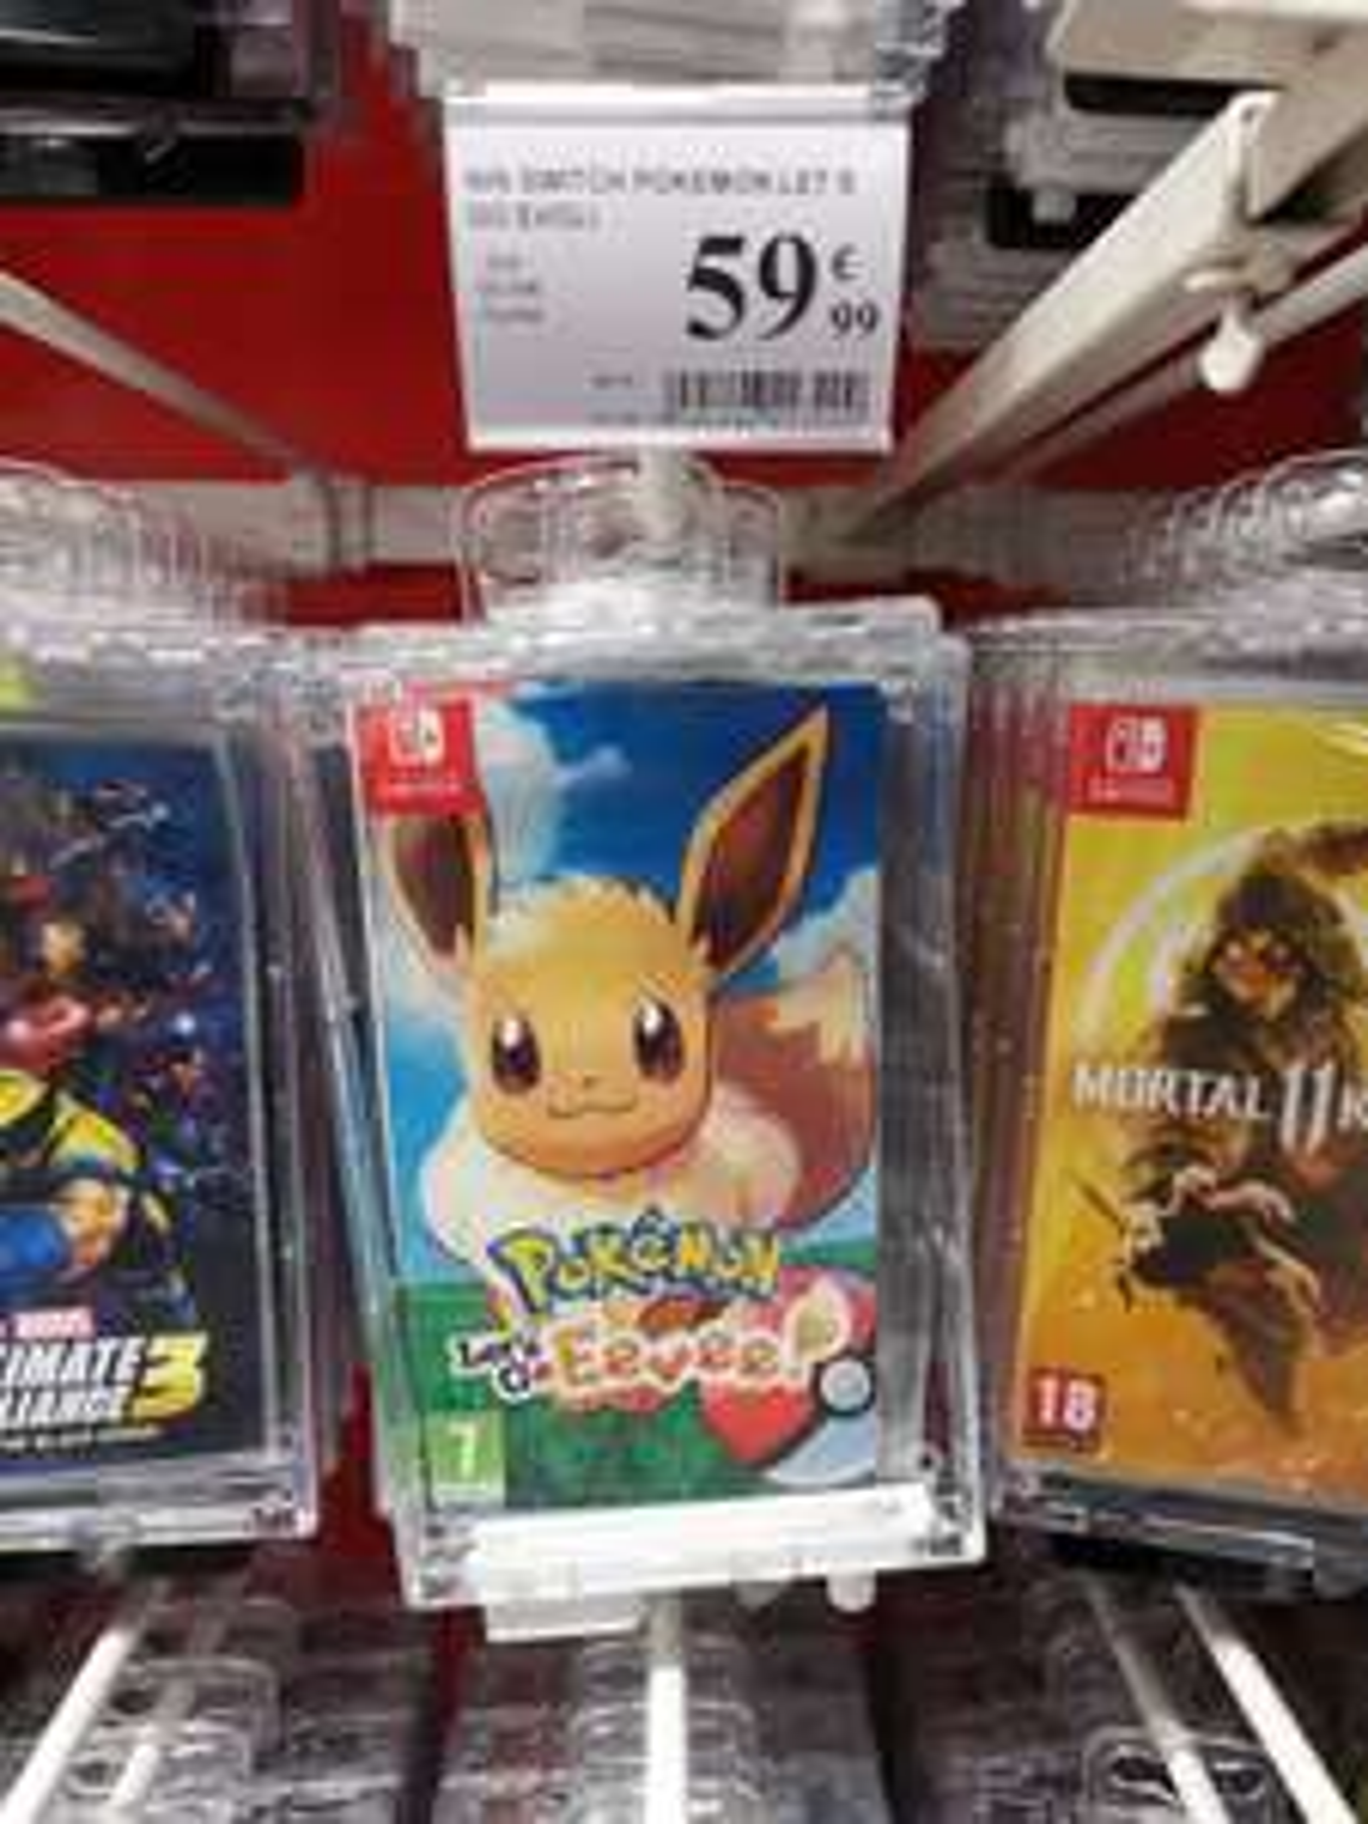 Pokémon Let's Go Evoli sur Nintendo Switch - Fontenay sous bois (94)